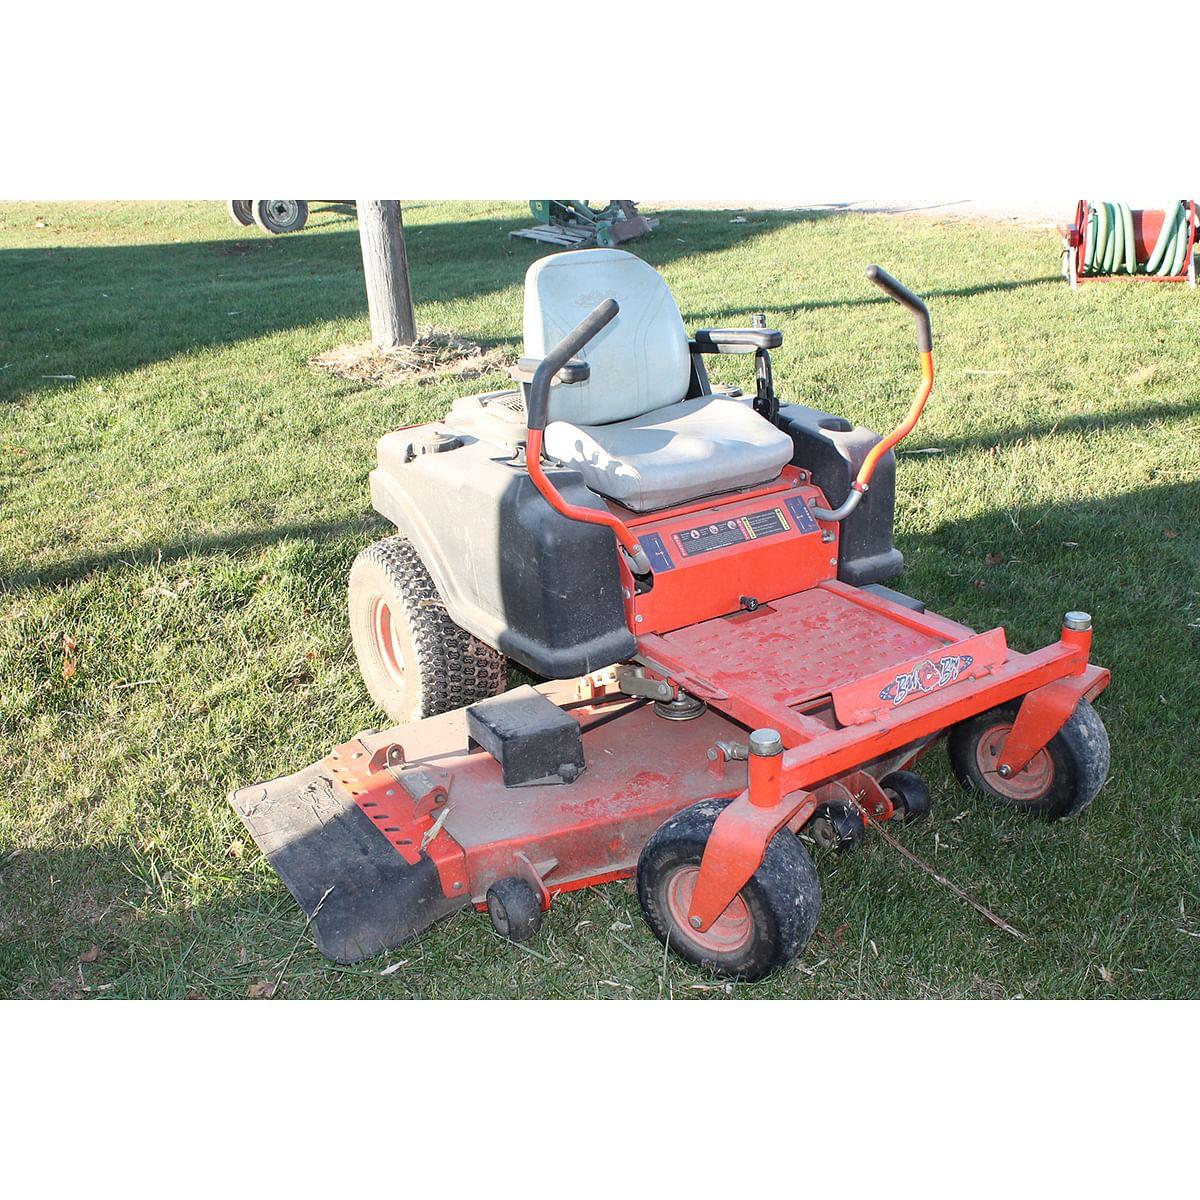 Waymire Farm Equipment Auction | The Wendt Group, Inc